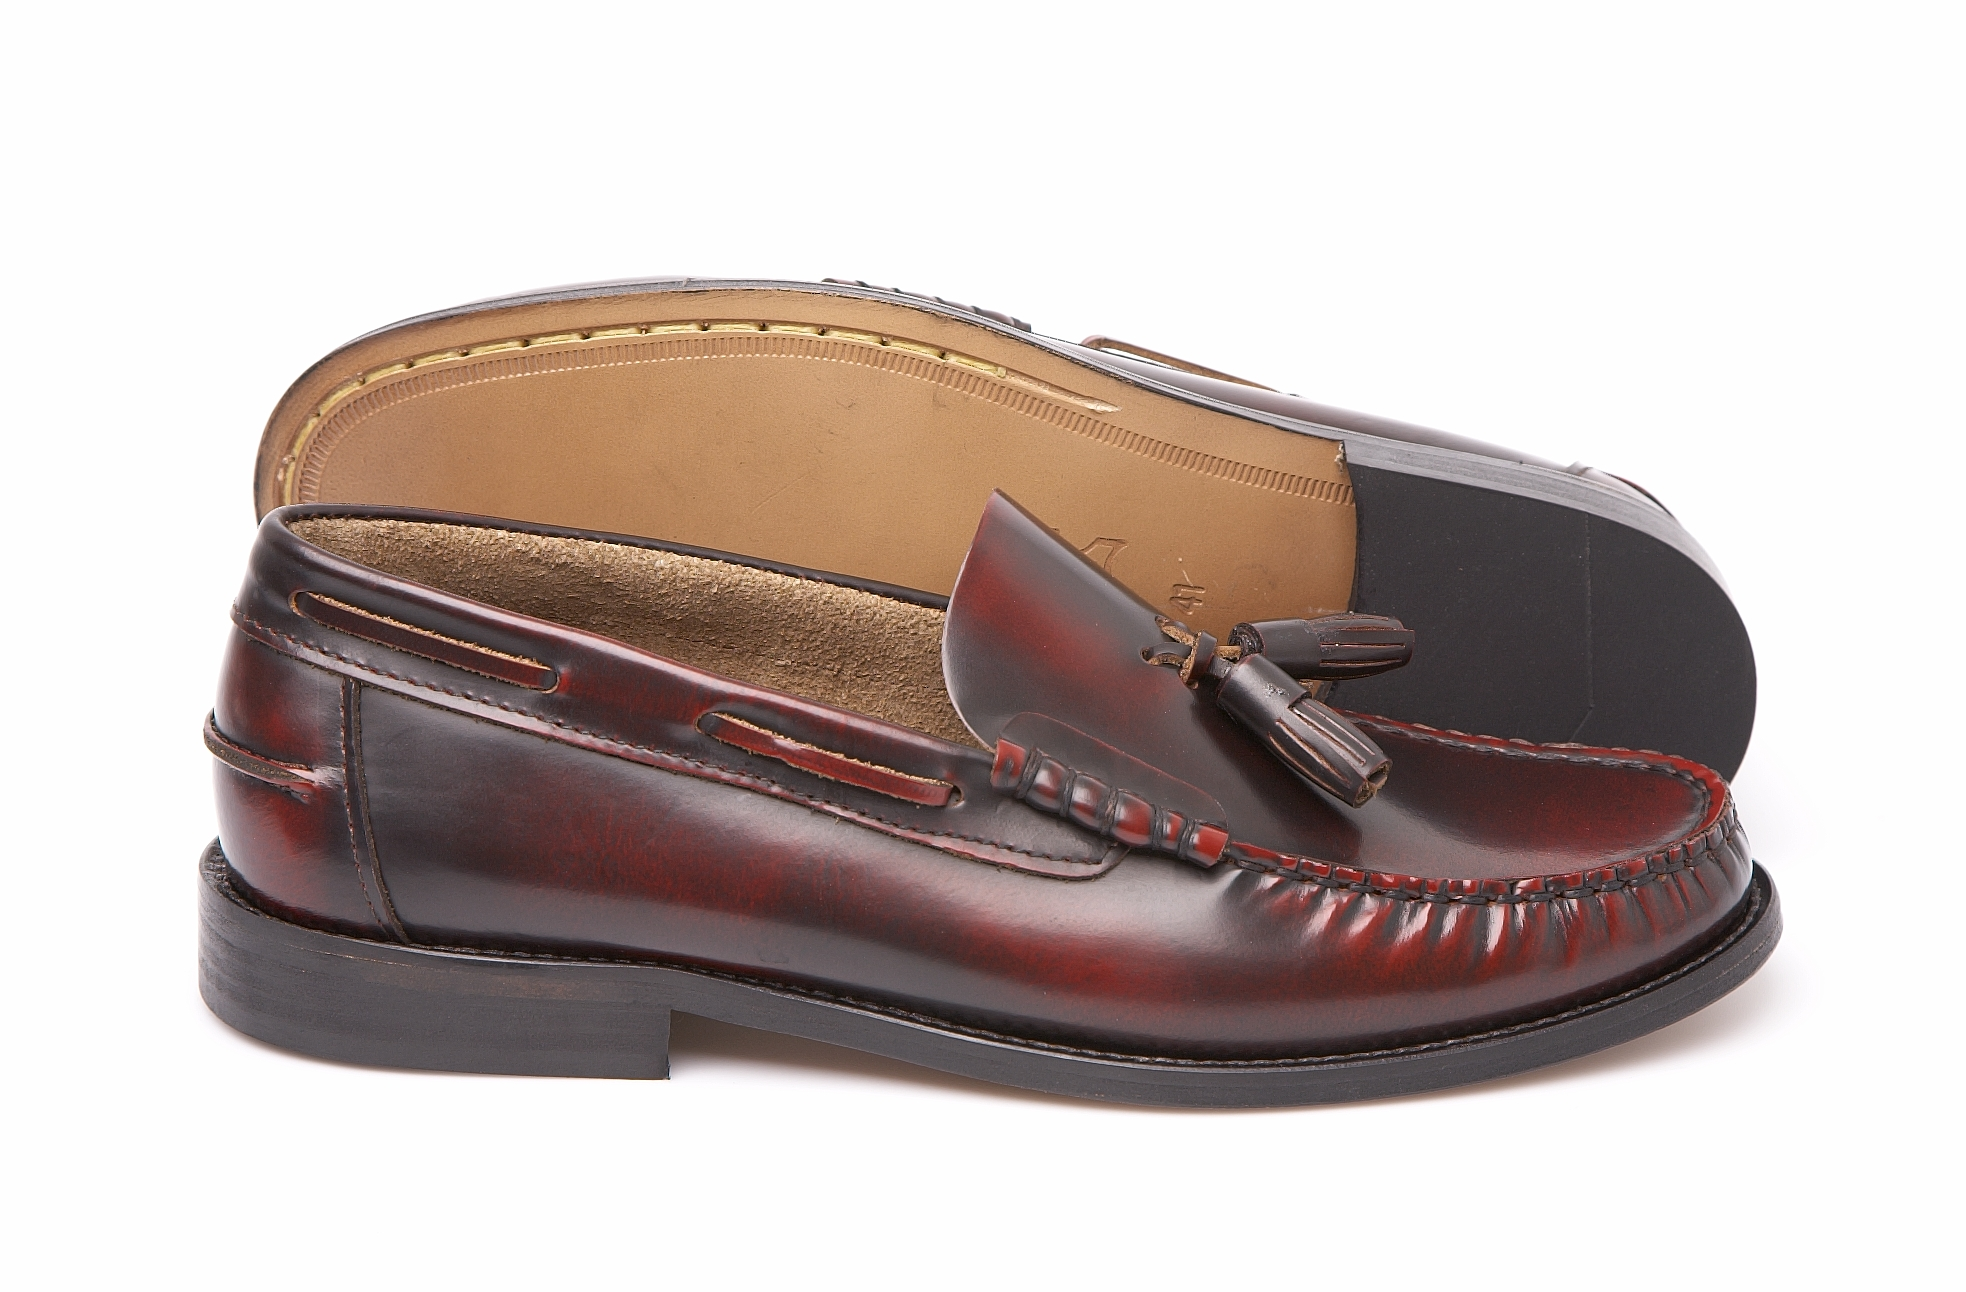 Delicious Junction Merton Mod Beefroll Tassel Leather Loafer Shoe Ox